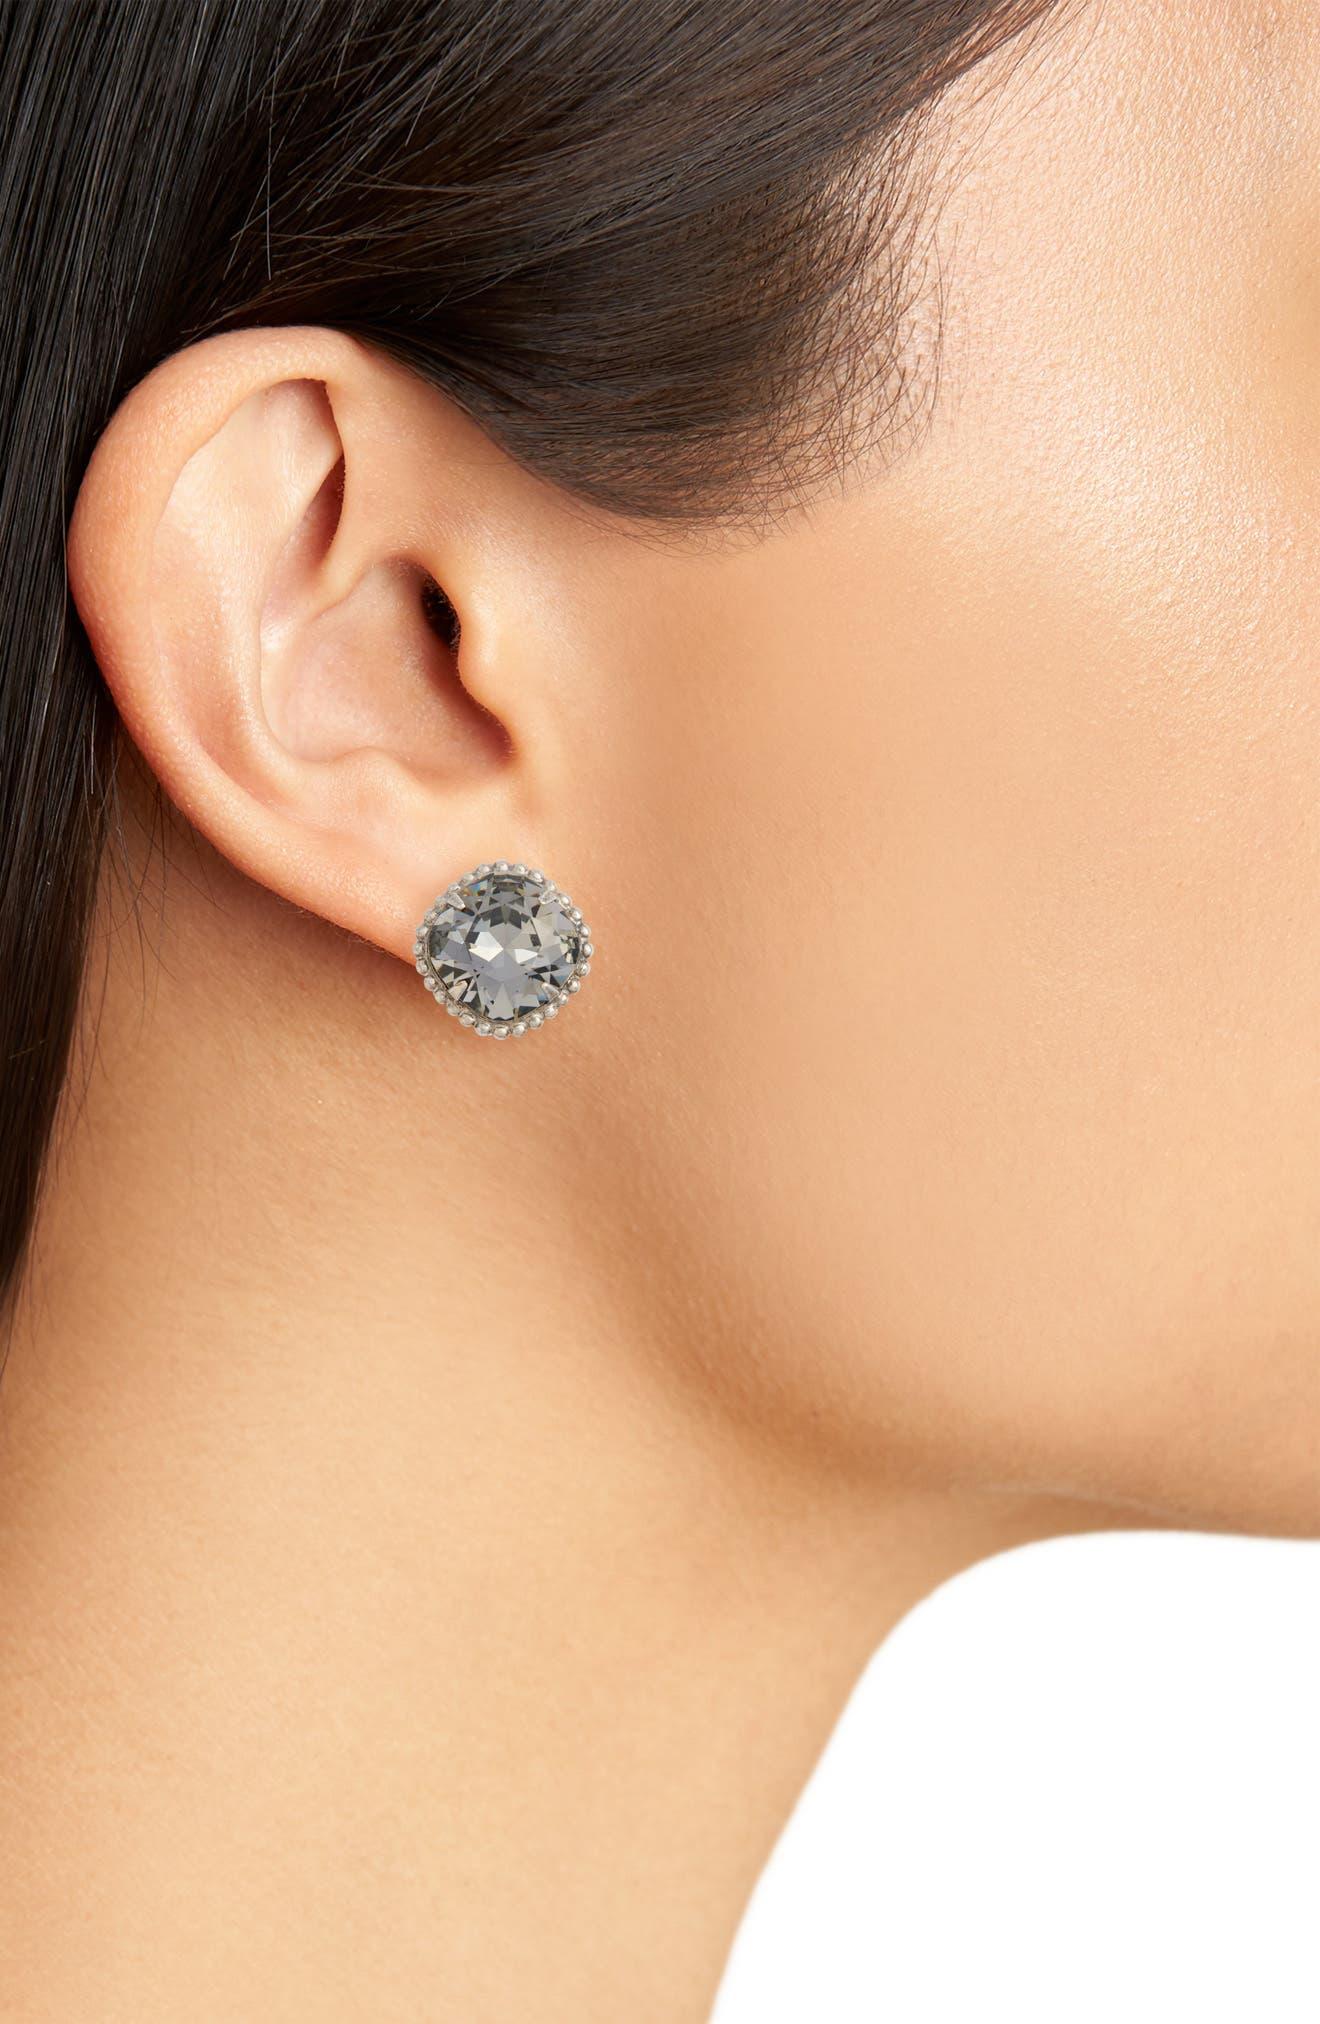 Cushion Cut Solitaire Stud Earrings,                             Alternate thumbnail 2, color,                             BLACK